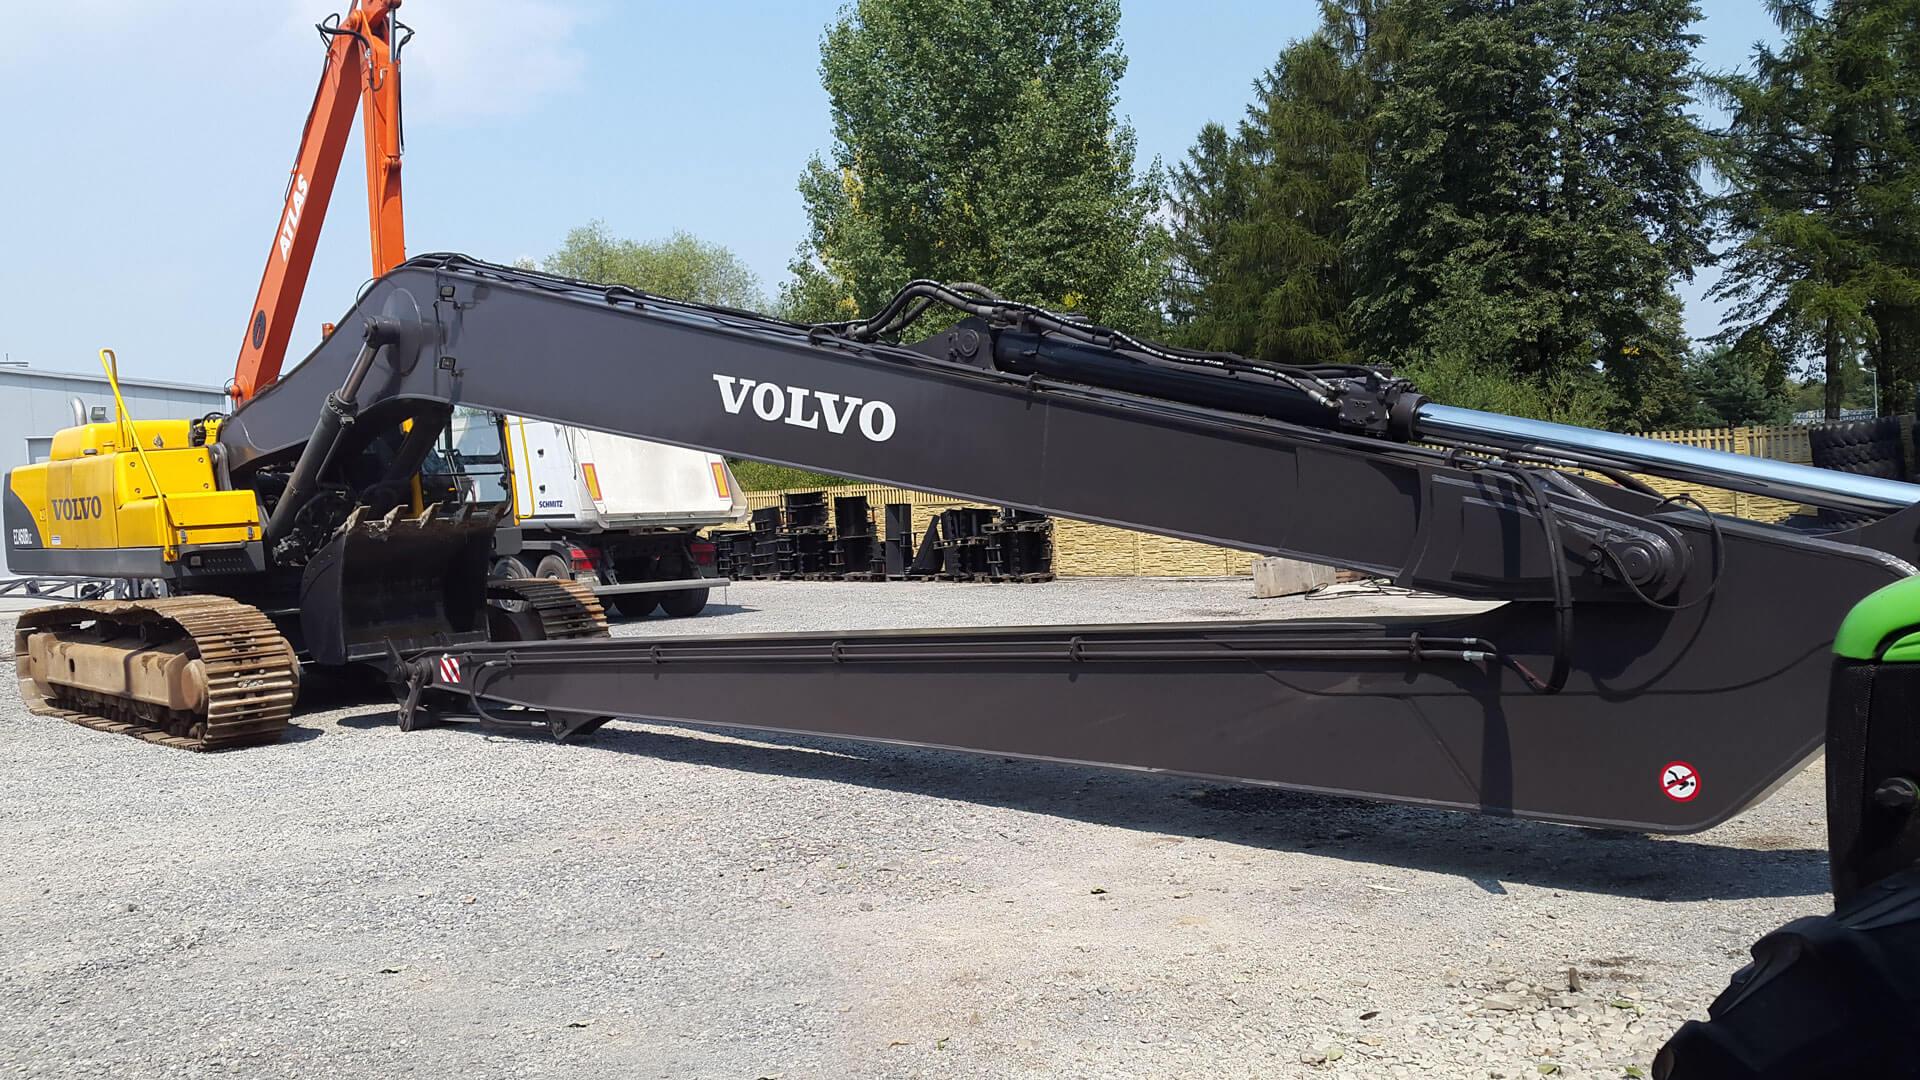 volvo-EC460Blc-long-reach-1